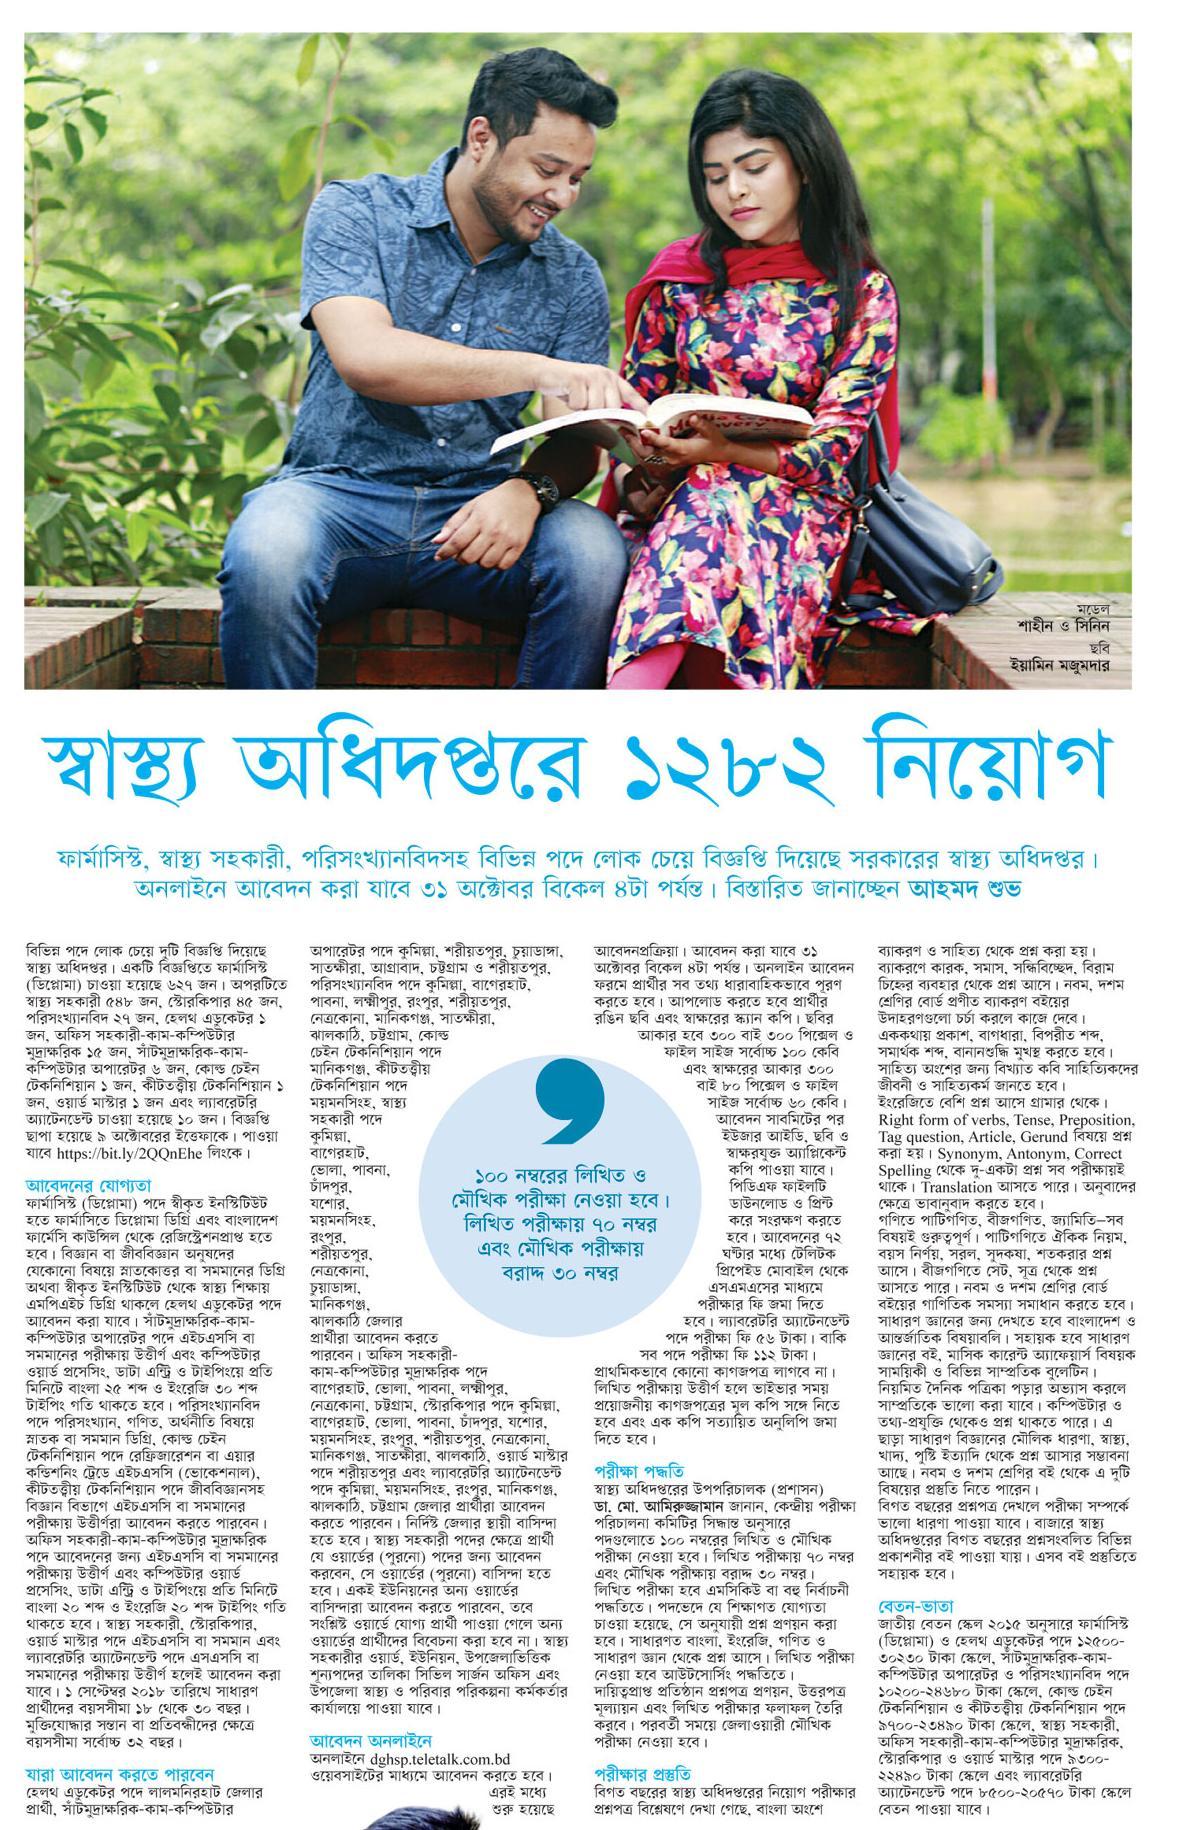 Kalerkantho Weekly Jobs Newspaper 2018Kormo Khali